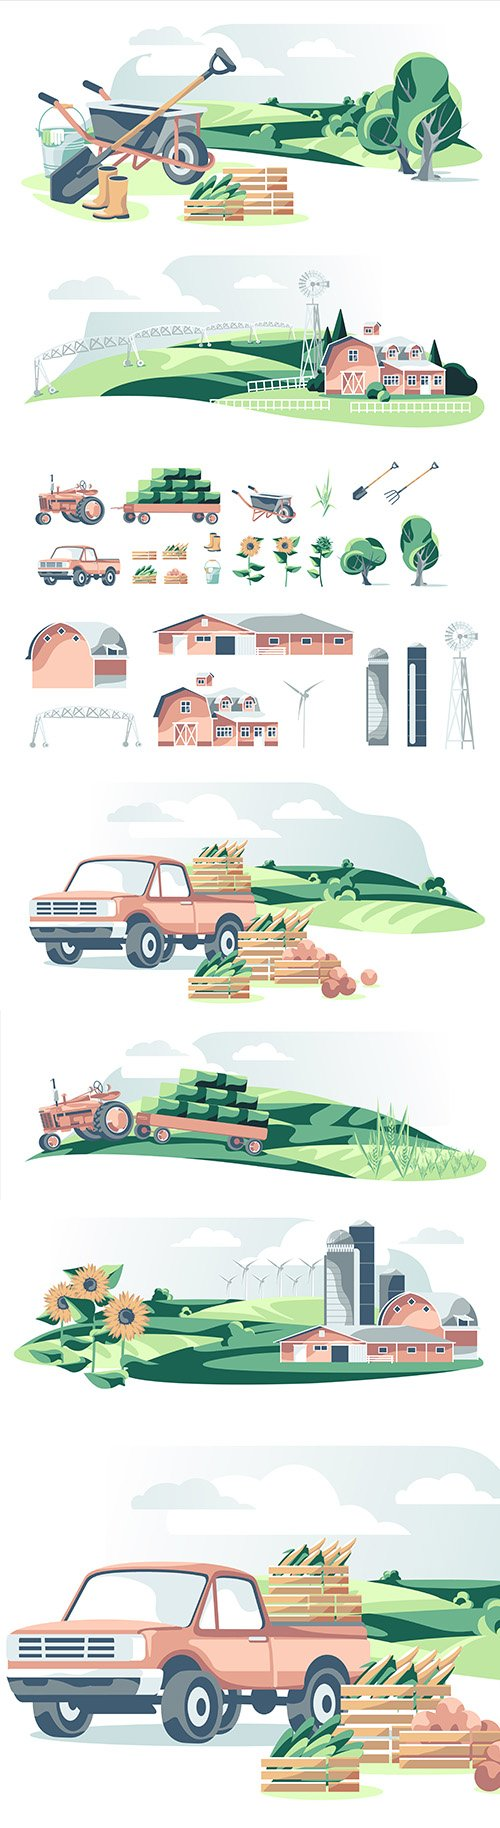 Agricultural equipment and landscape illustration